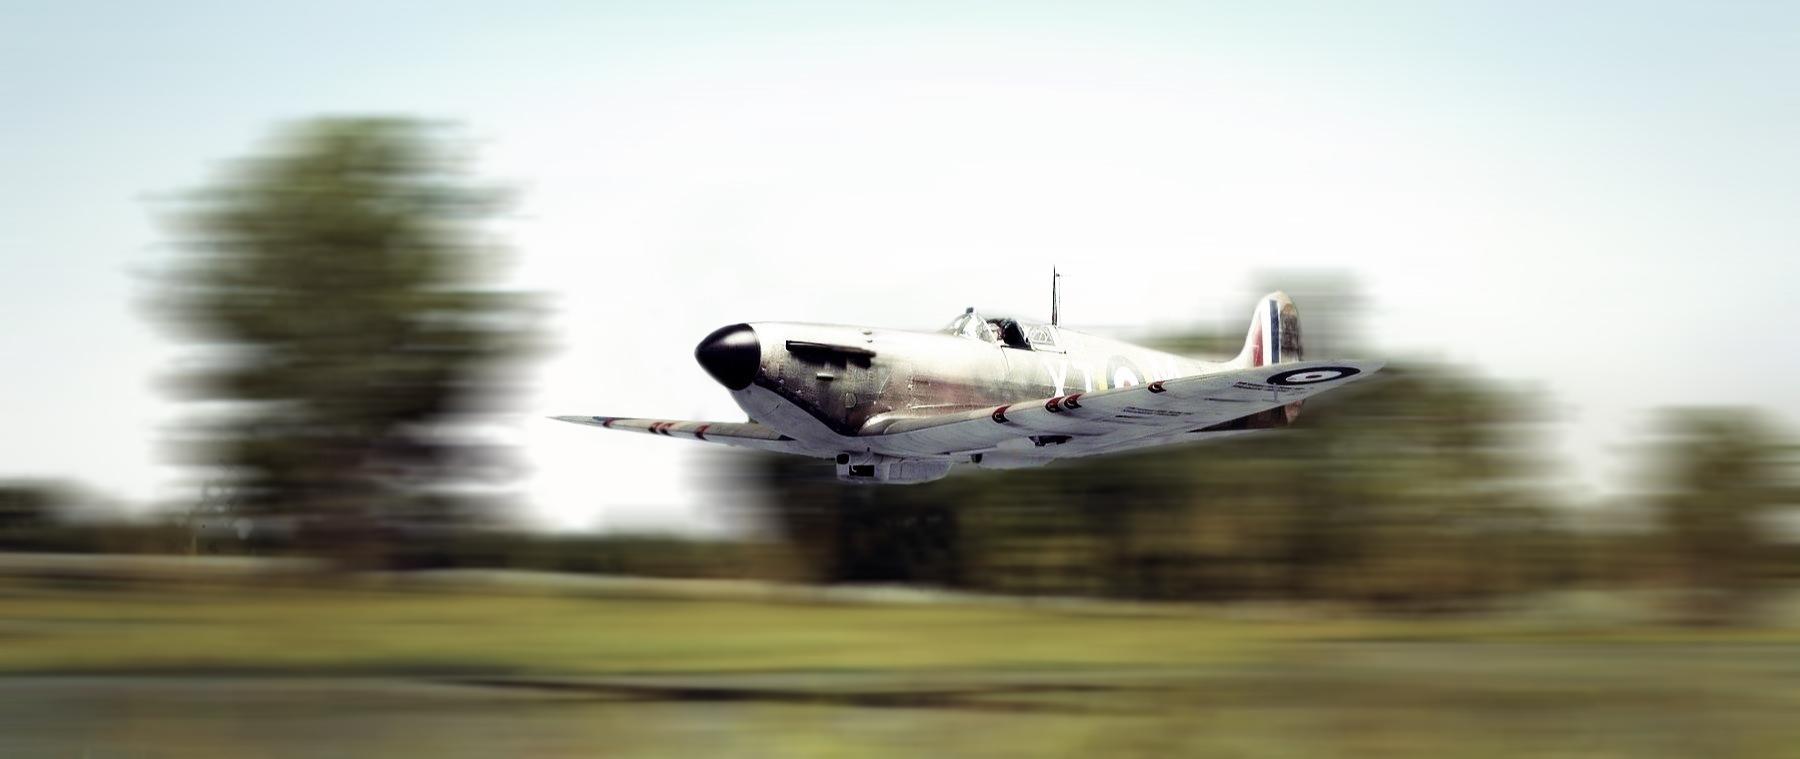 http://www.pilote-virtuel.com/img/gallery/1525441181.jpg